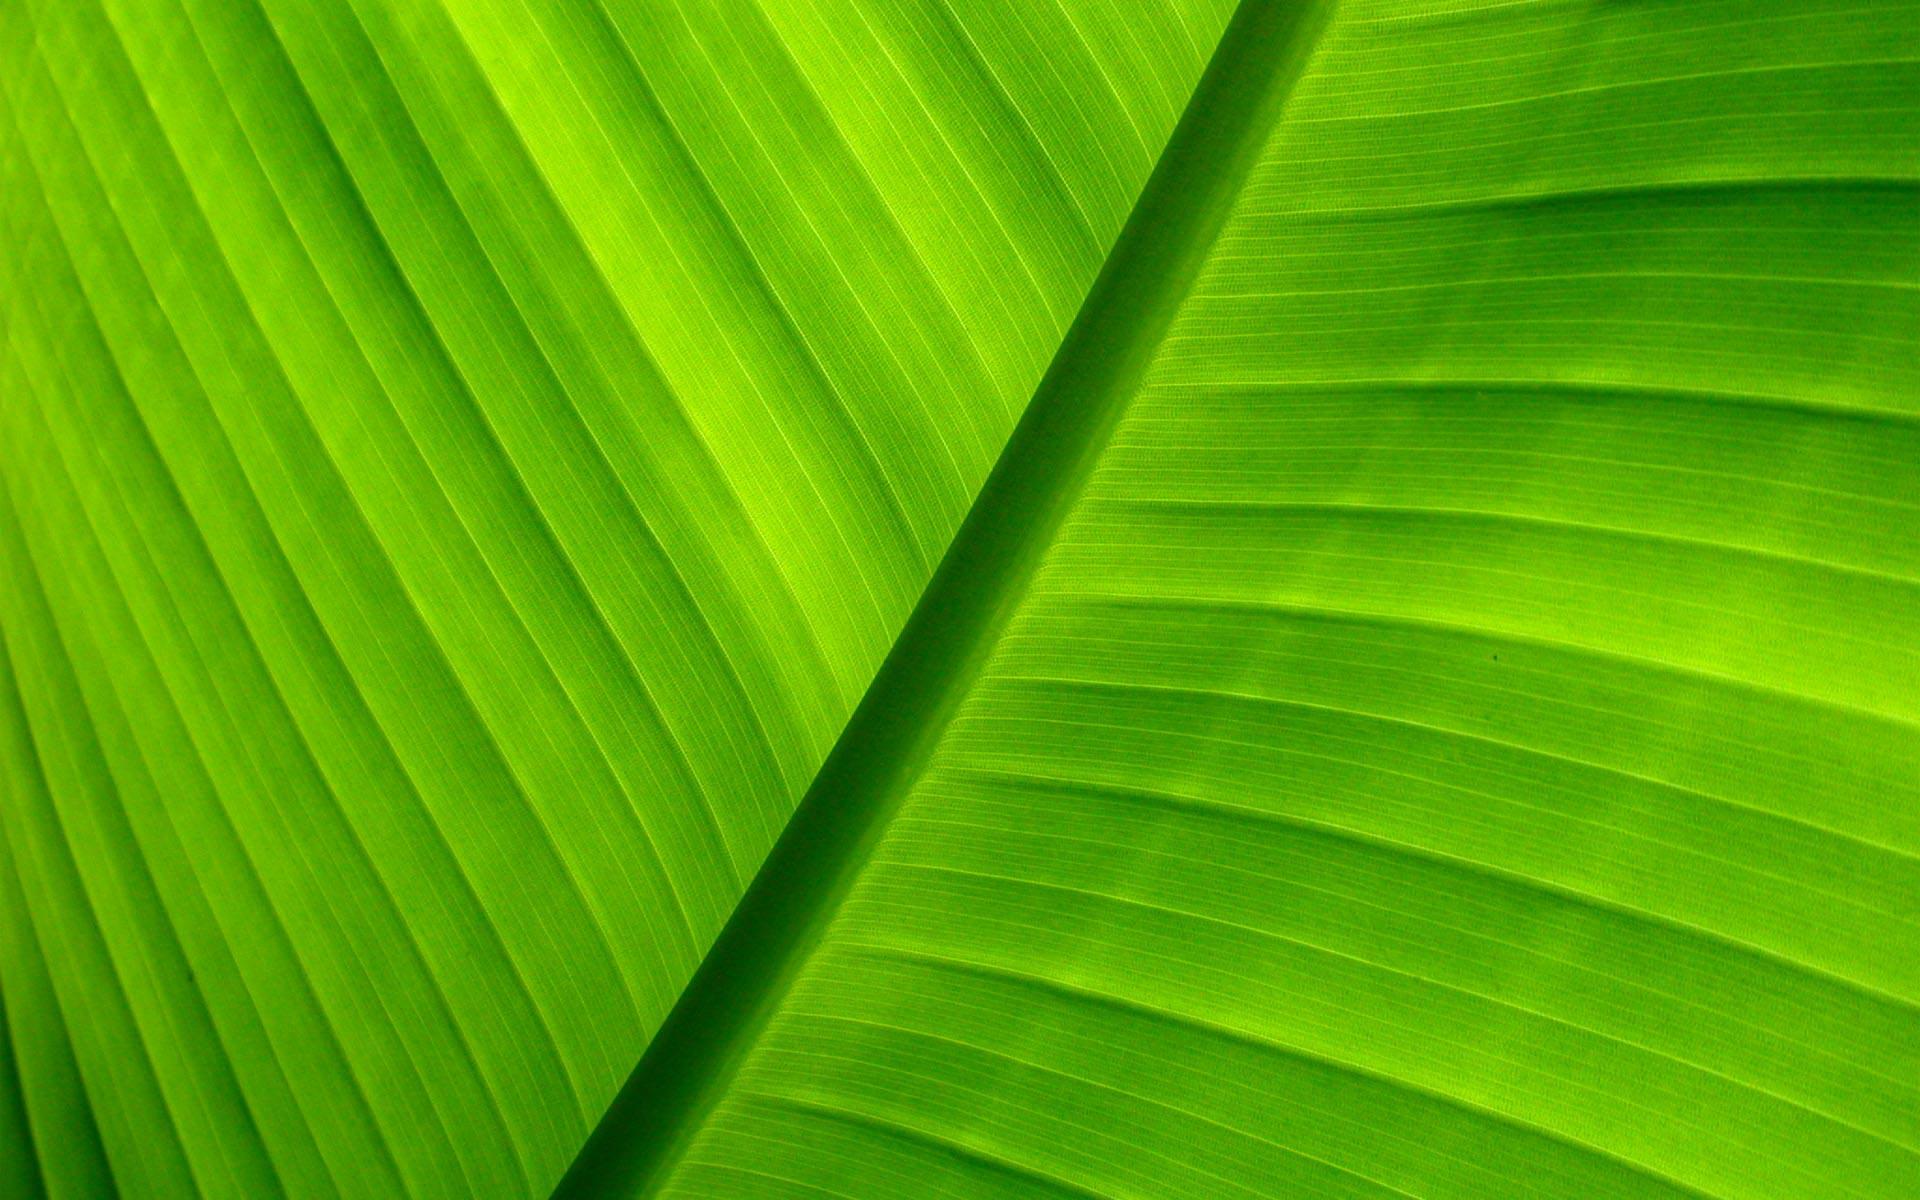 Green Background wallpaper   432774 1920x1200